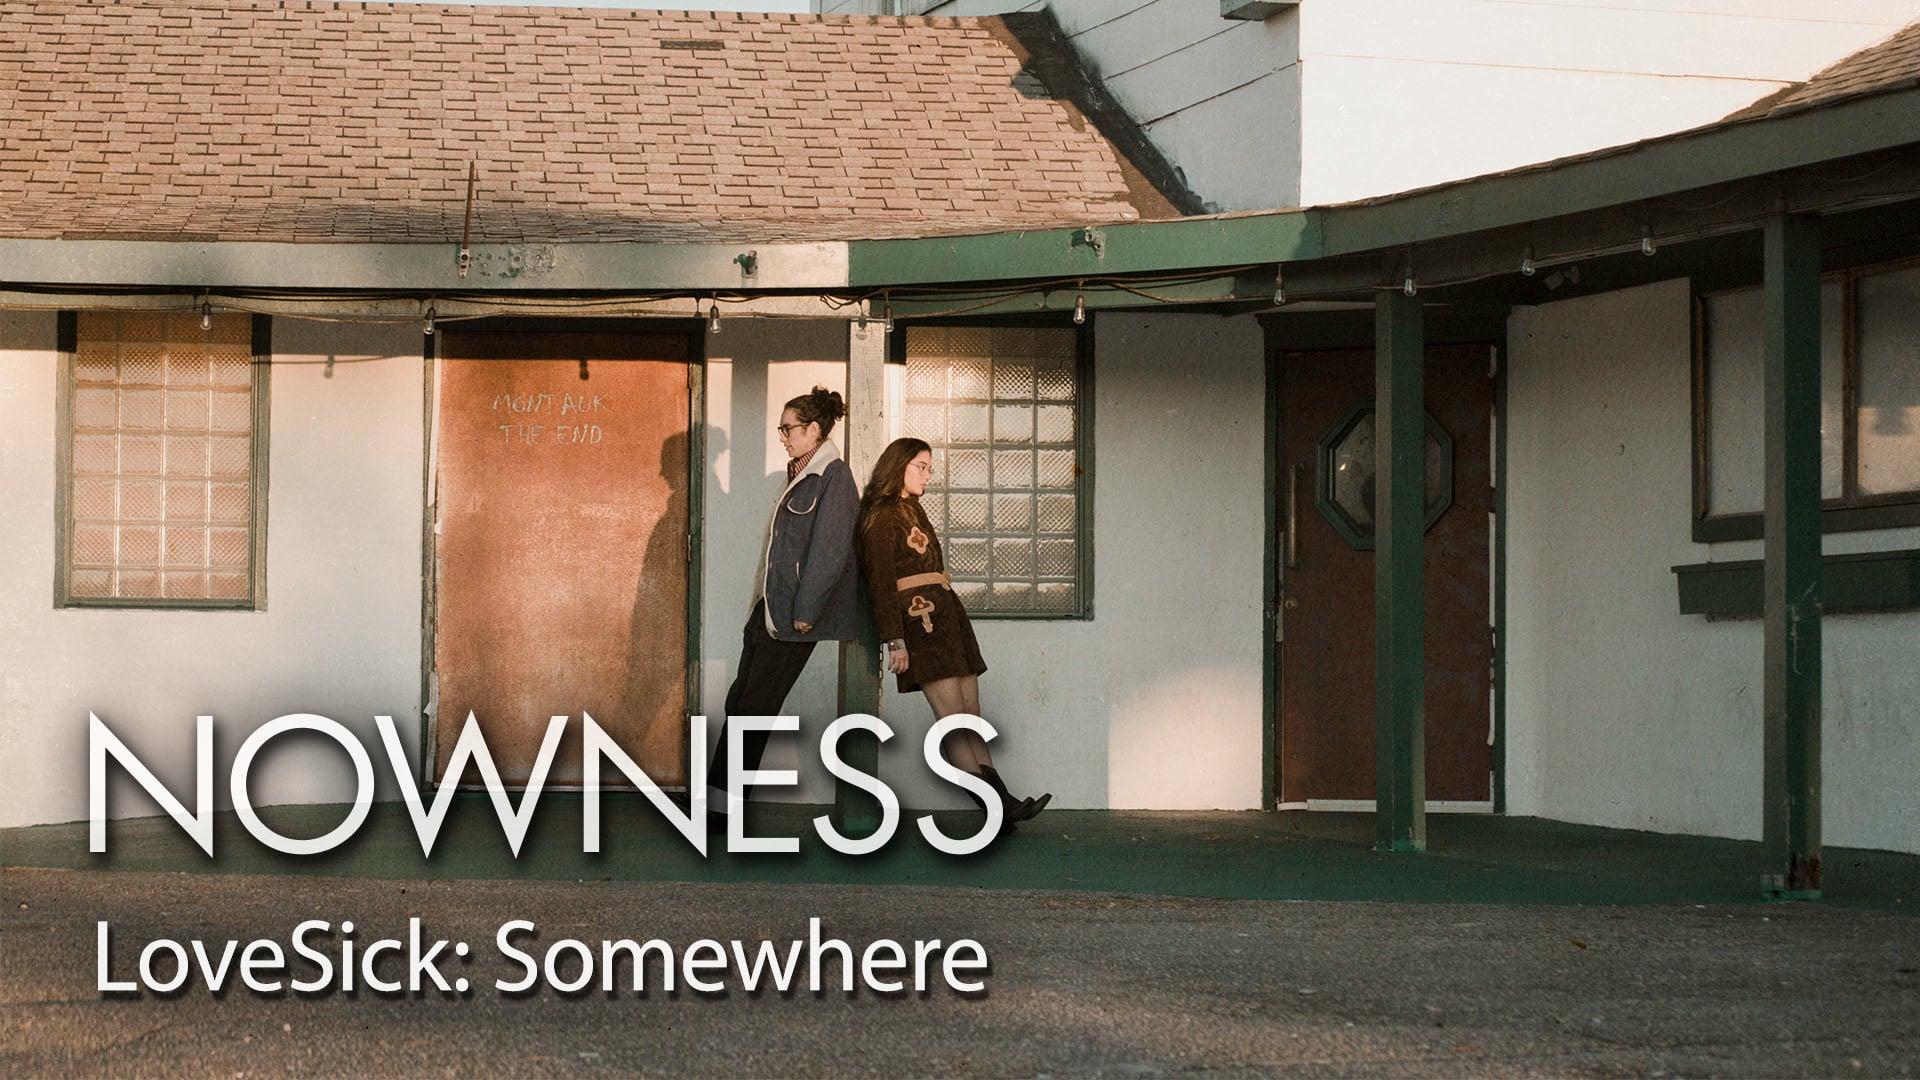 LoveSick: Somewhere